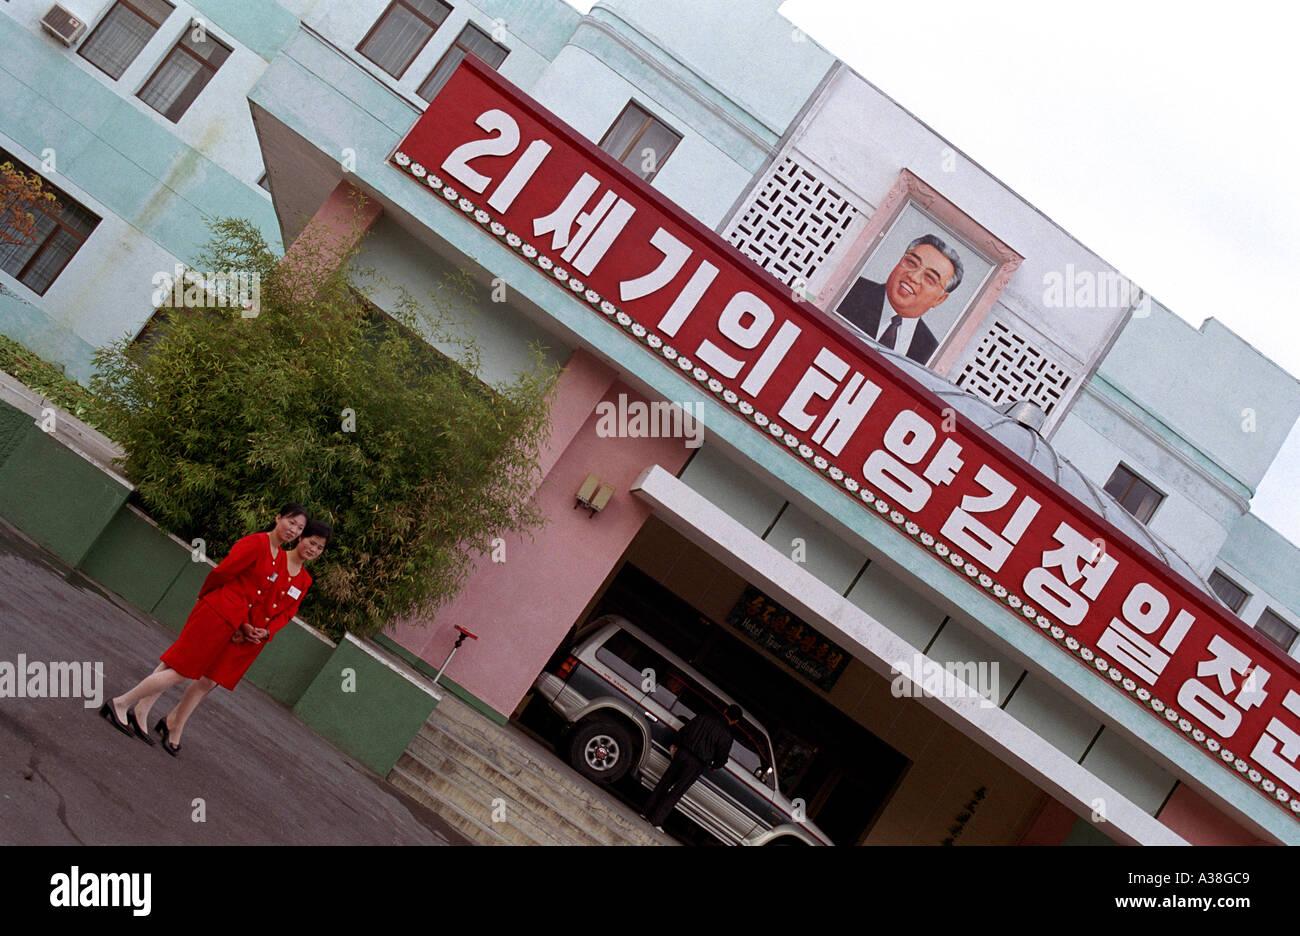 Songdowon Hotel Wonsan North Korea Stock Photo